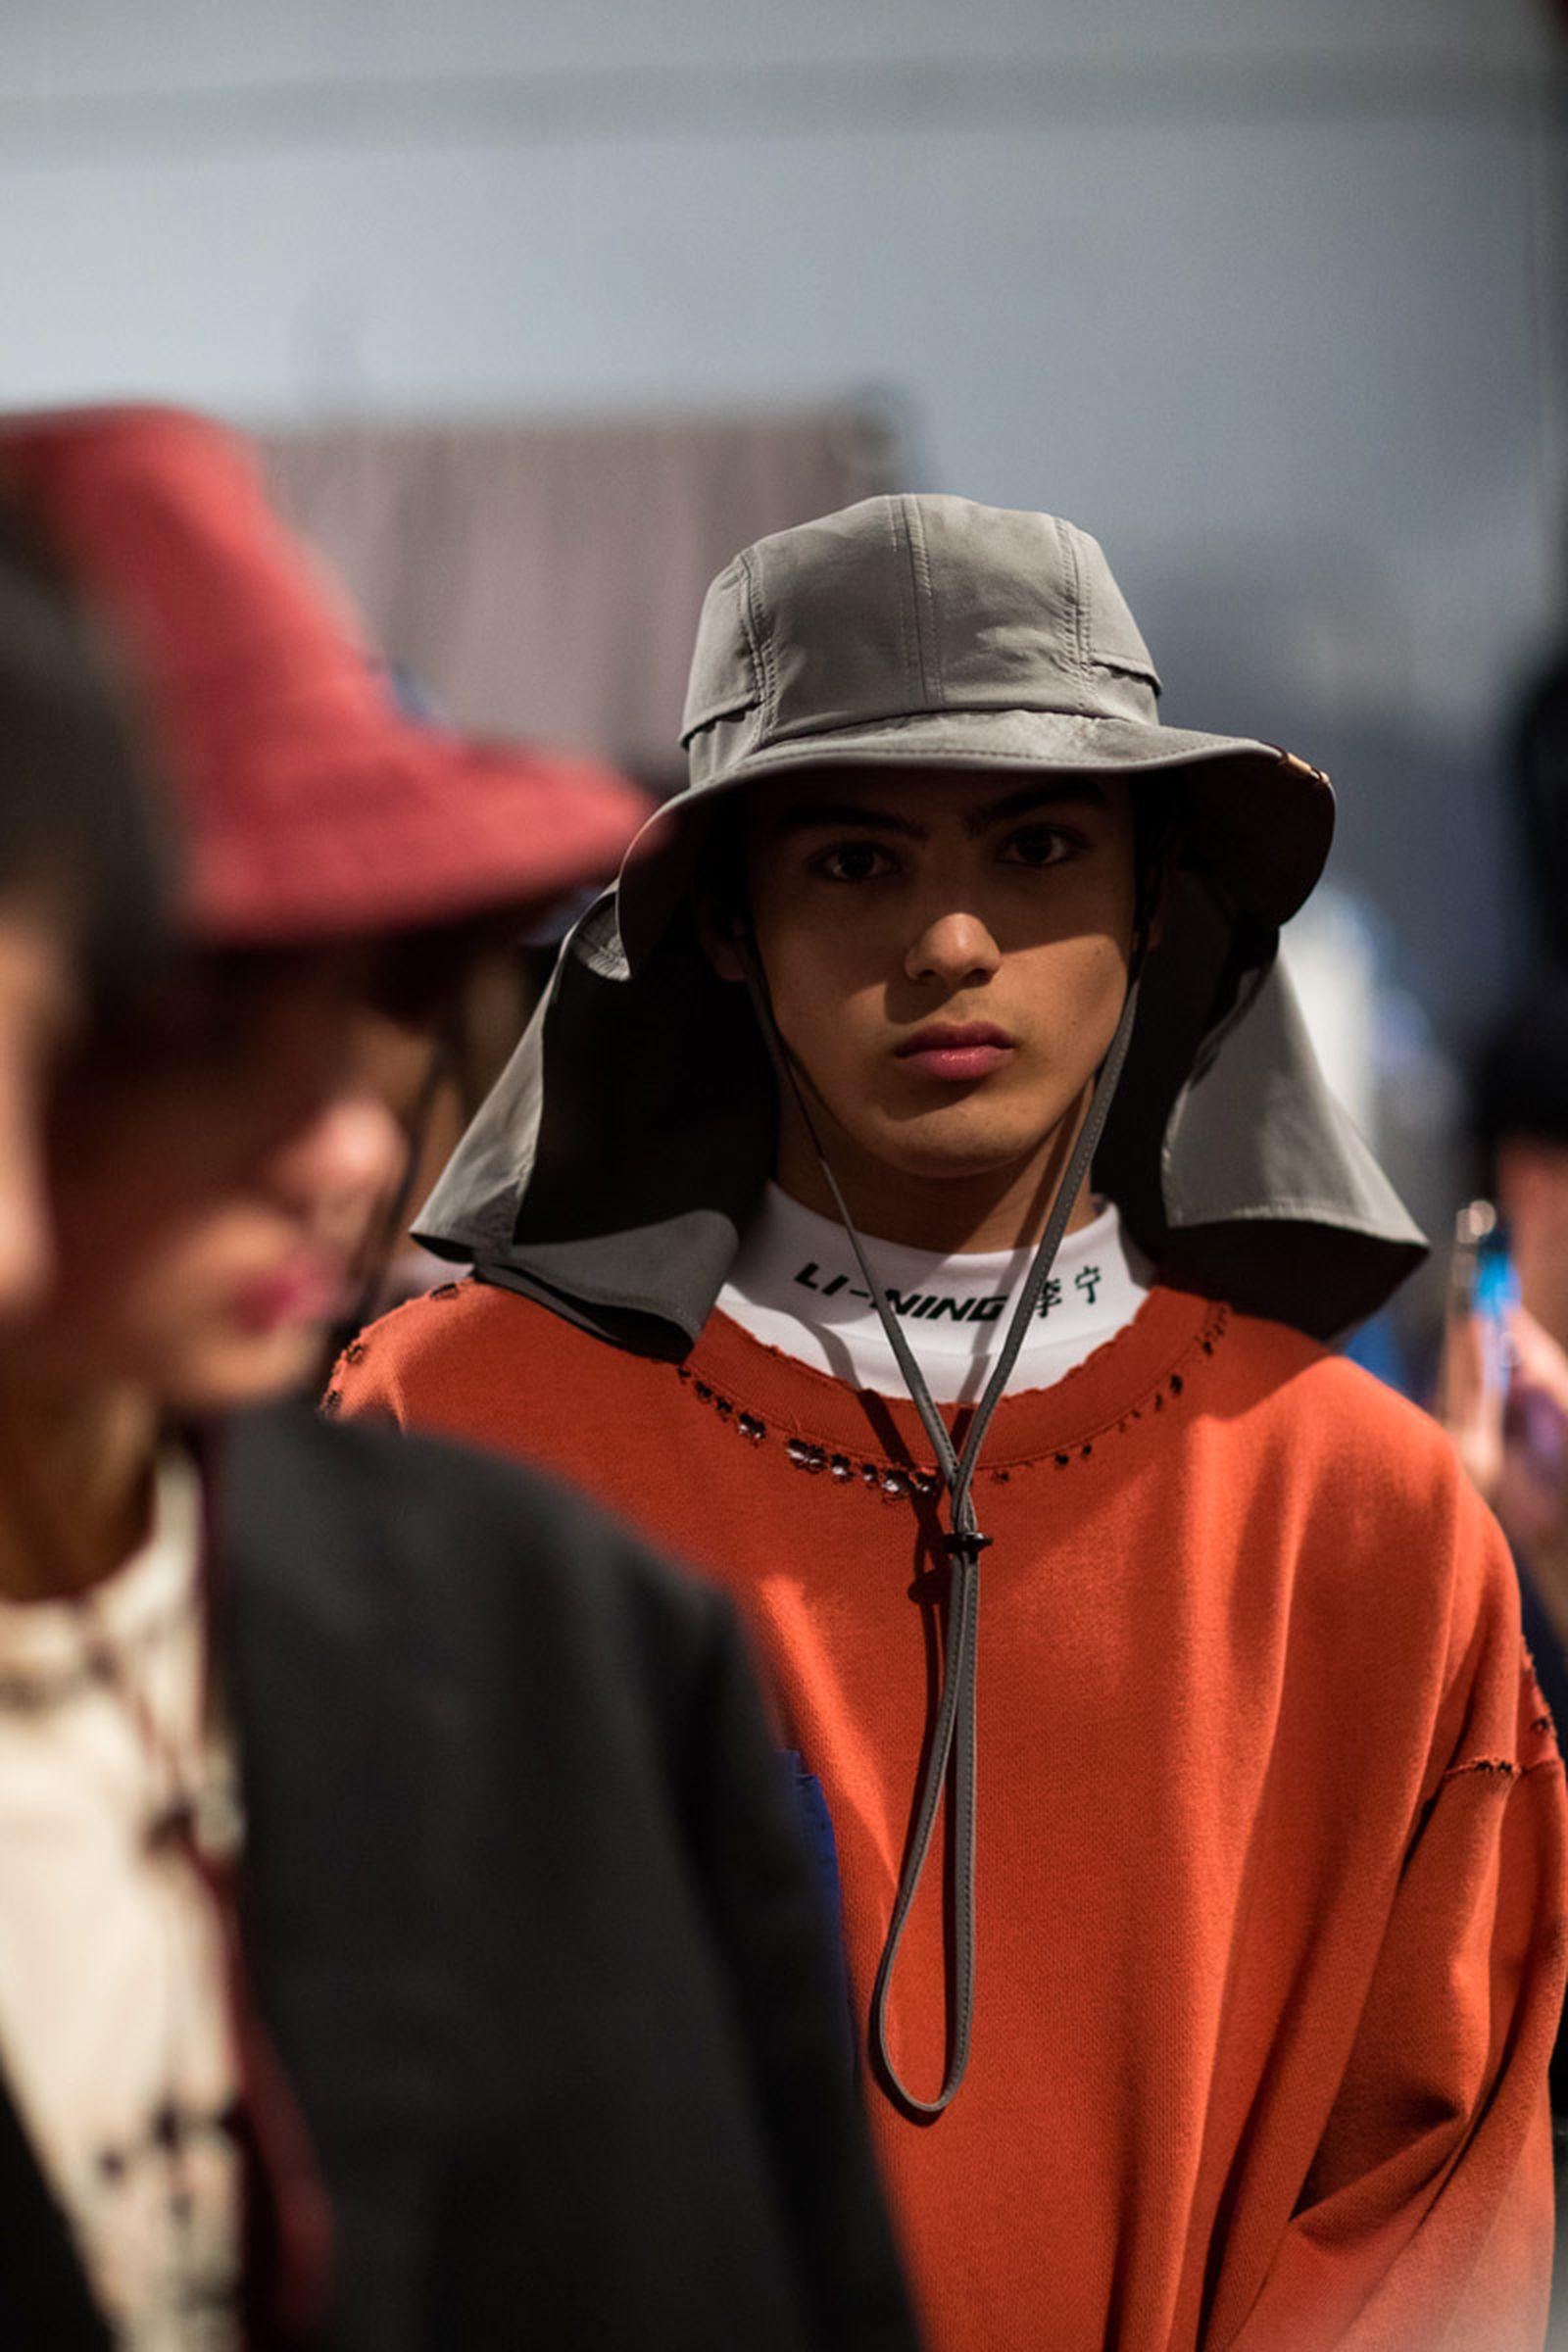 13li ning fw19 new york fashion week fall winter 2019 fashion shows nyfw